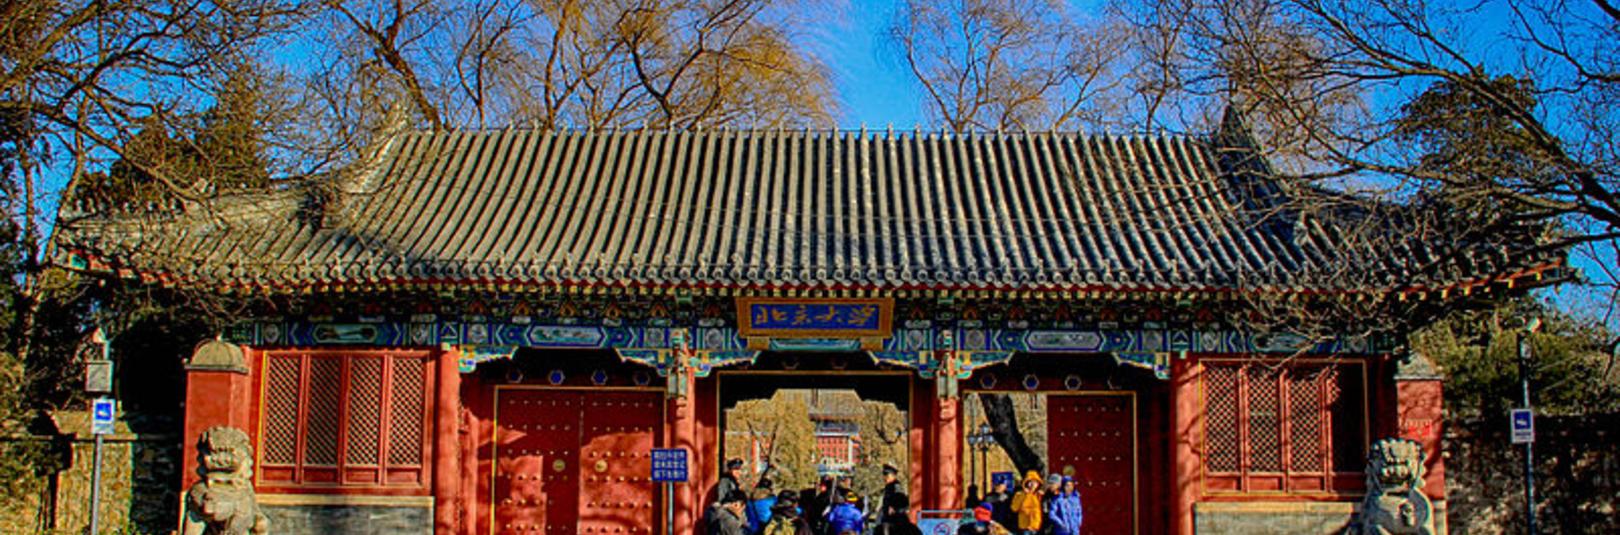 Peking-háskóli